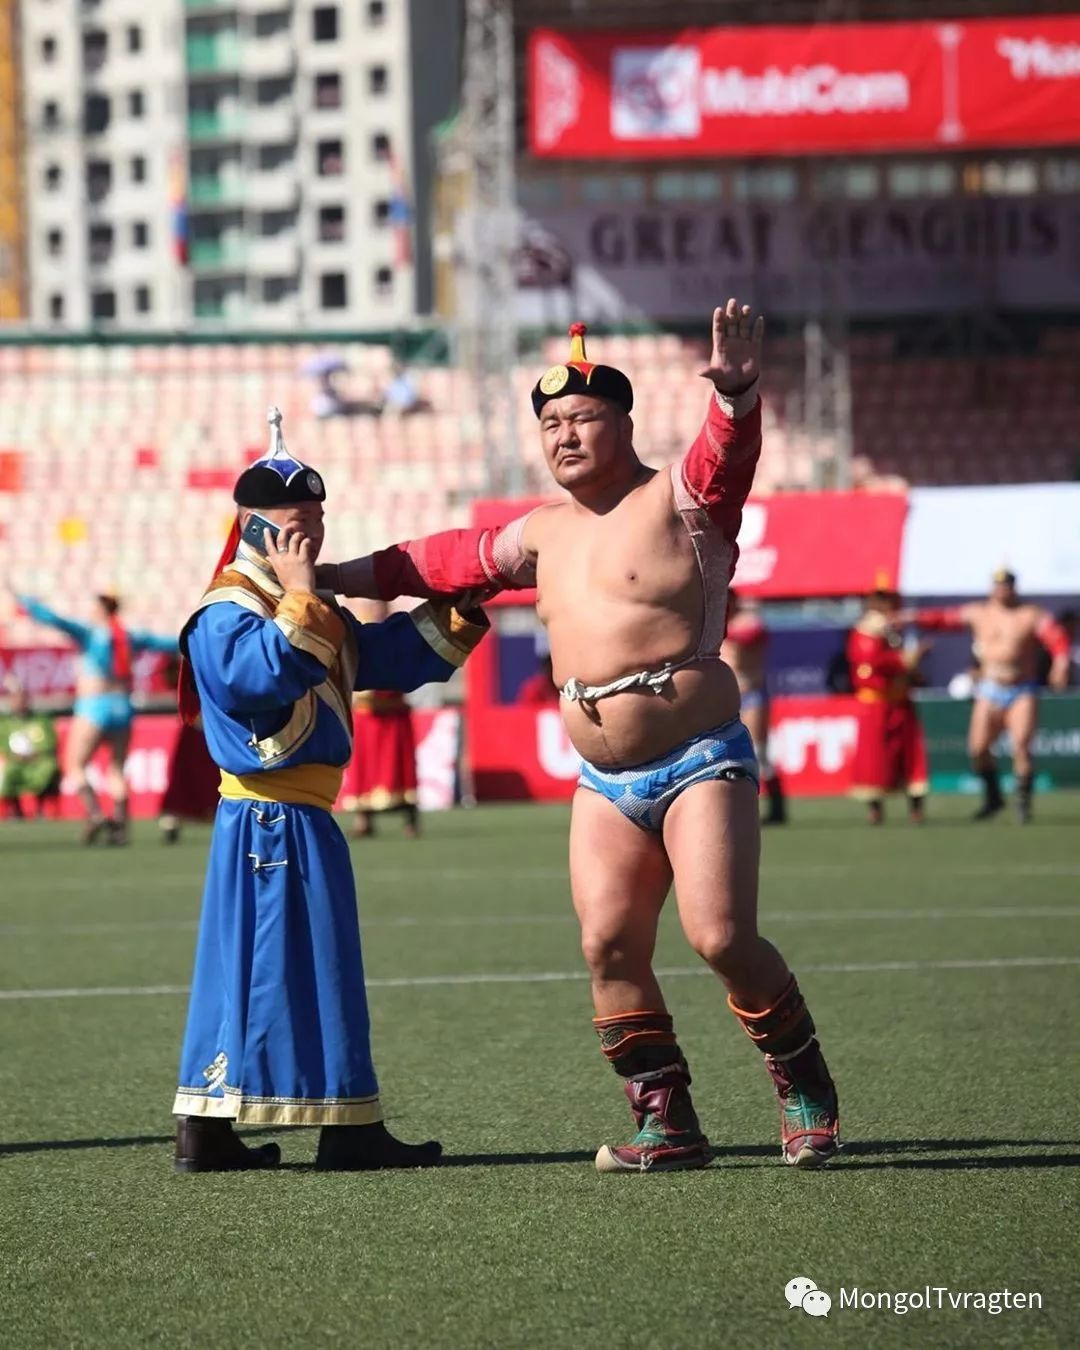 ᠮᠣᠩᠭᠣᠯ ᠨᠠᠭᠠᠳᠣᠮ 那达慕 第81张 ᠮᠣᠩᠭᠣᠯ ᠨᠠᠭᠠᠳᠣᠮ 那达慕 蒙古文化